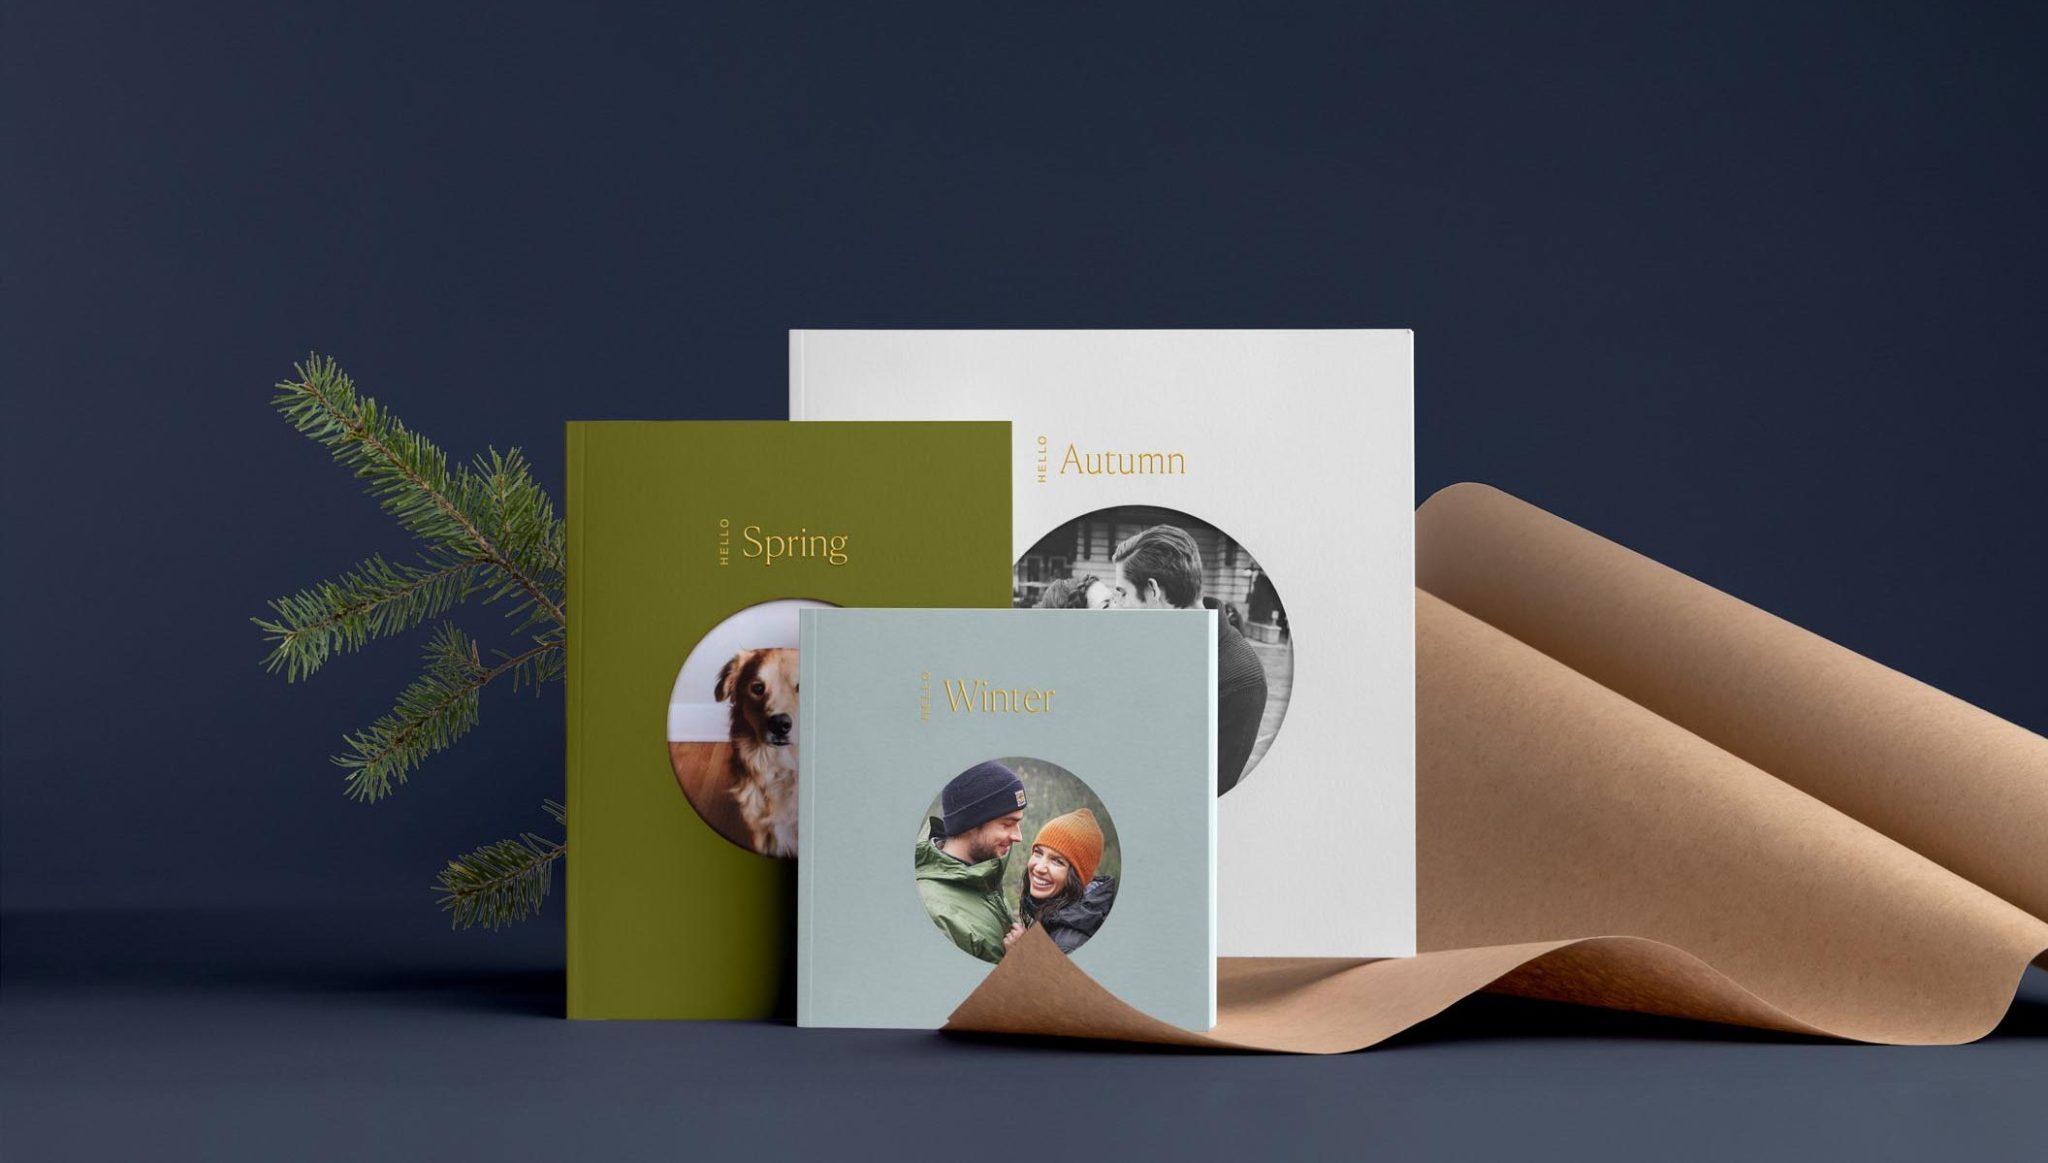 color-series-book-sale-studio-011